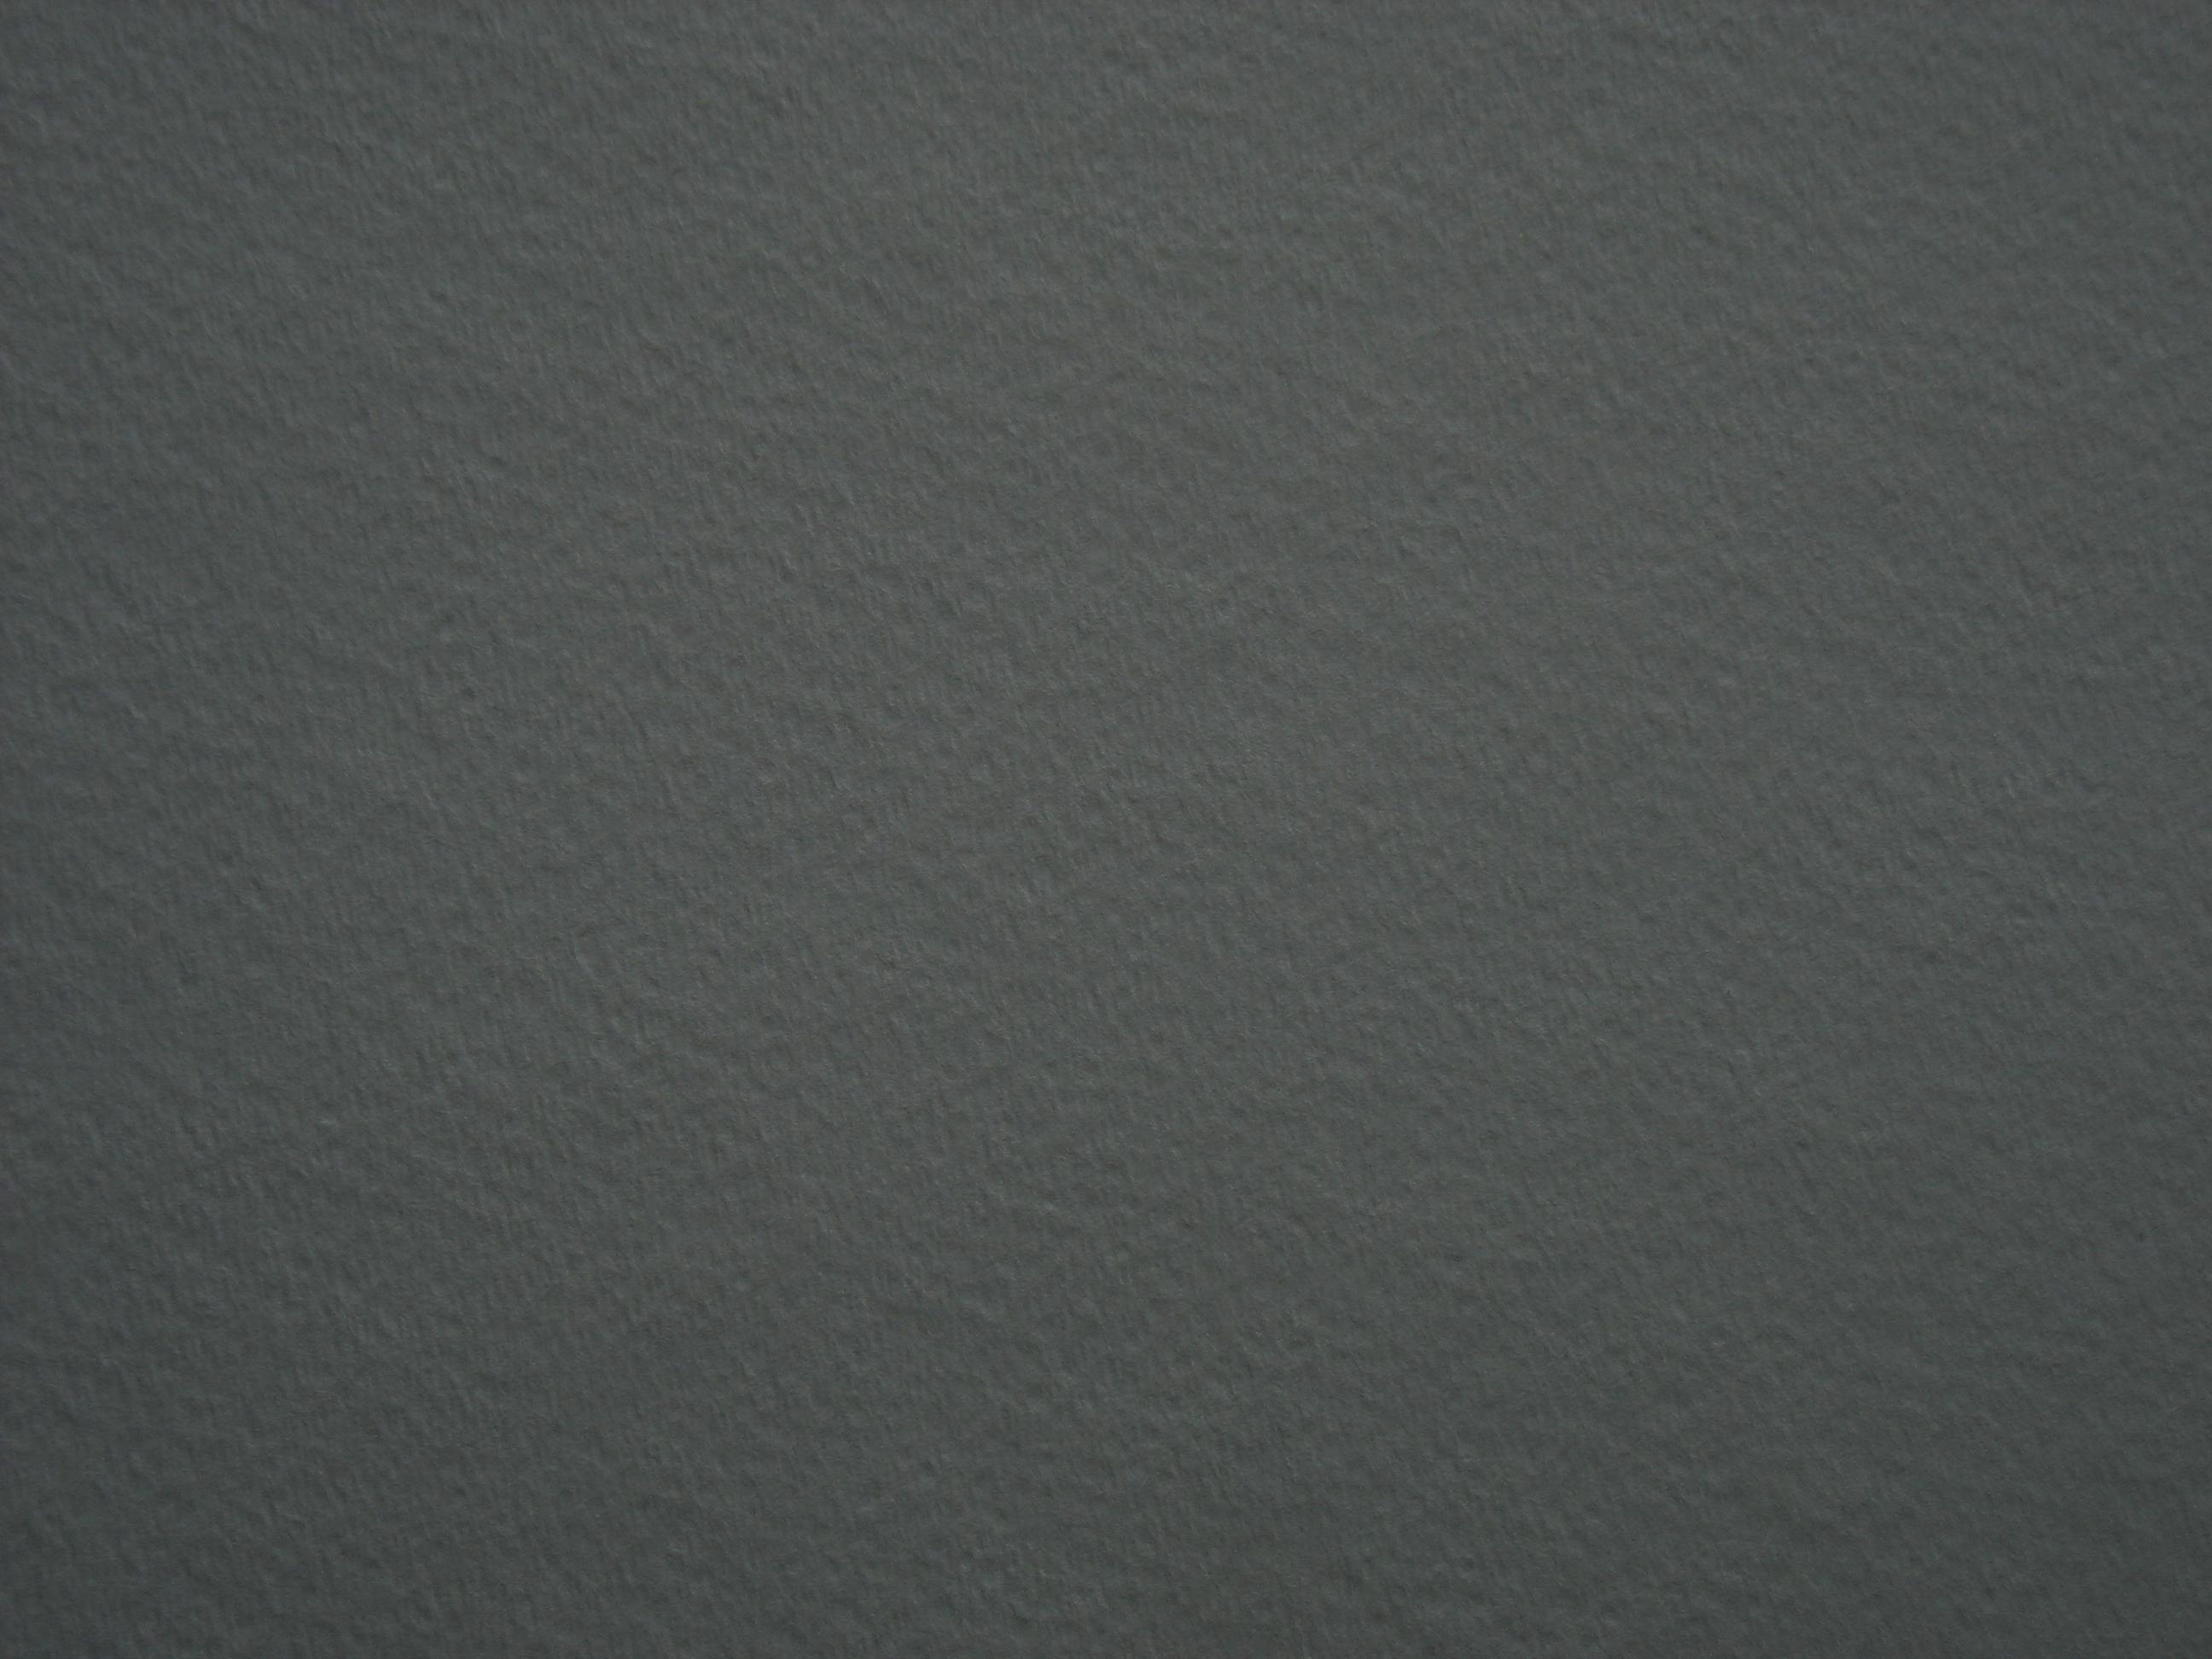 2592x1944 Watercolor Paper Textures